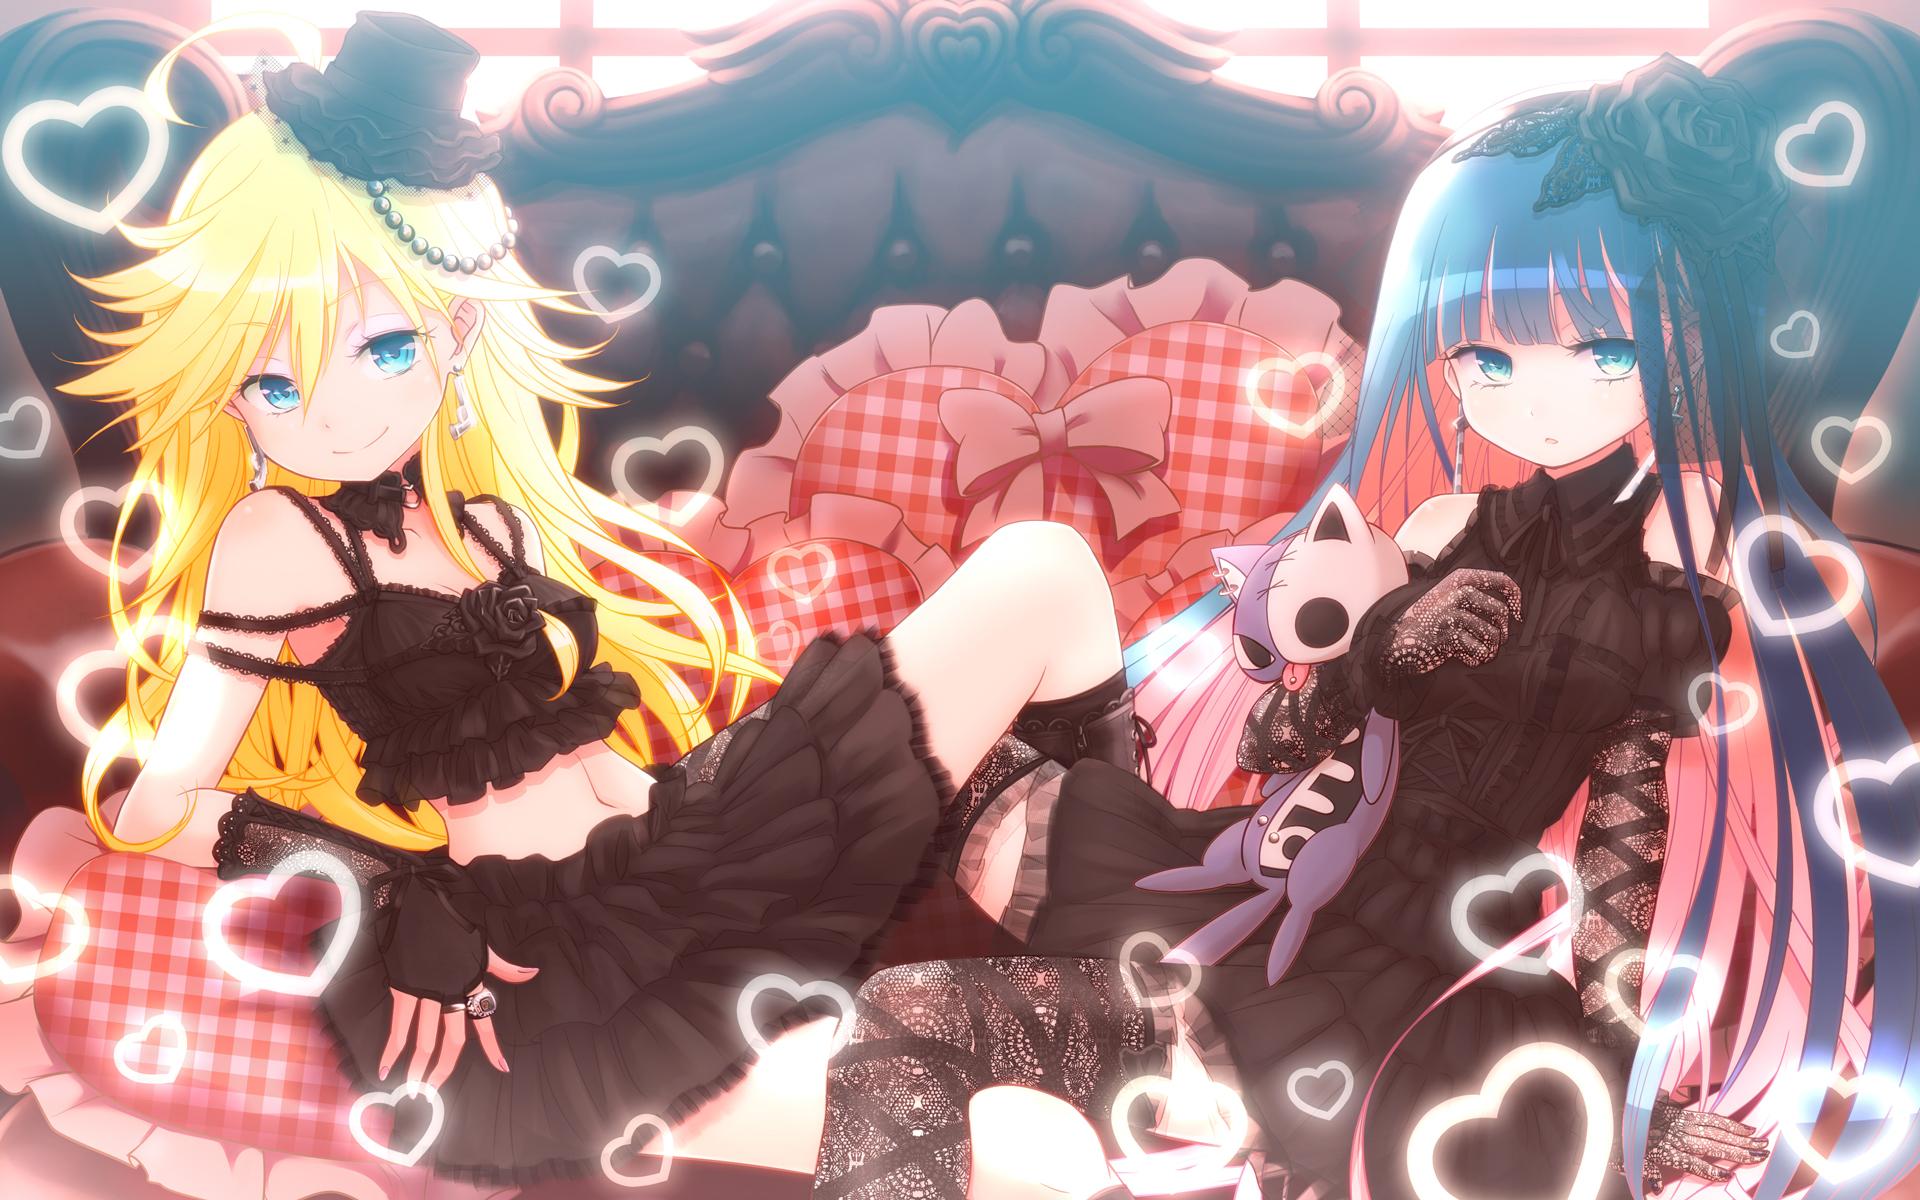 Panty And Stocking With Garterbelt Wallpaper Zerochan Anime